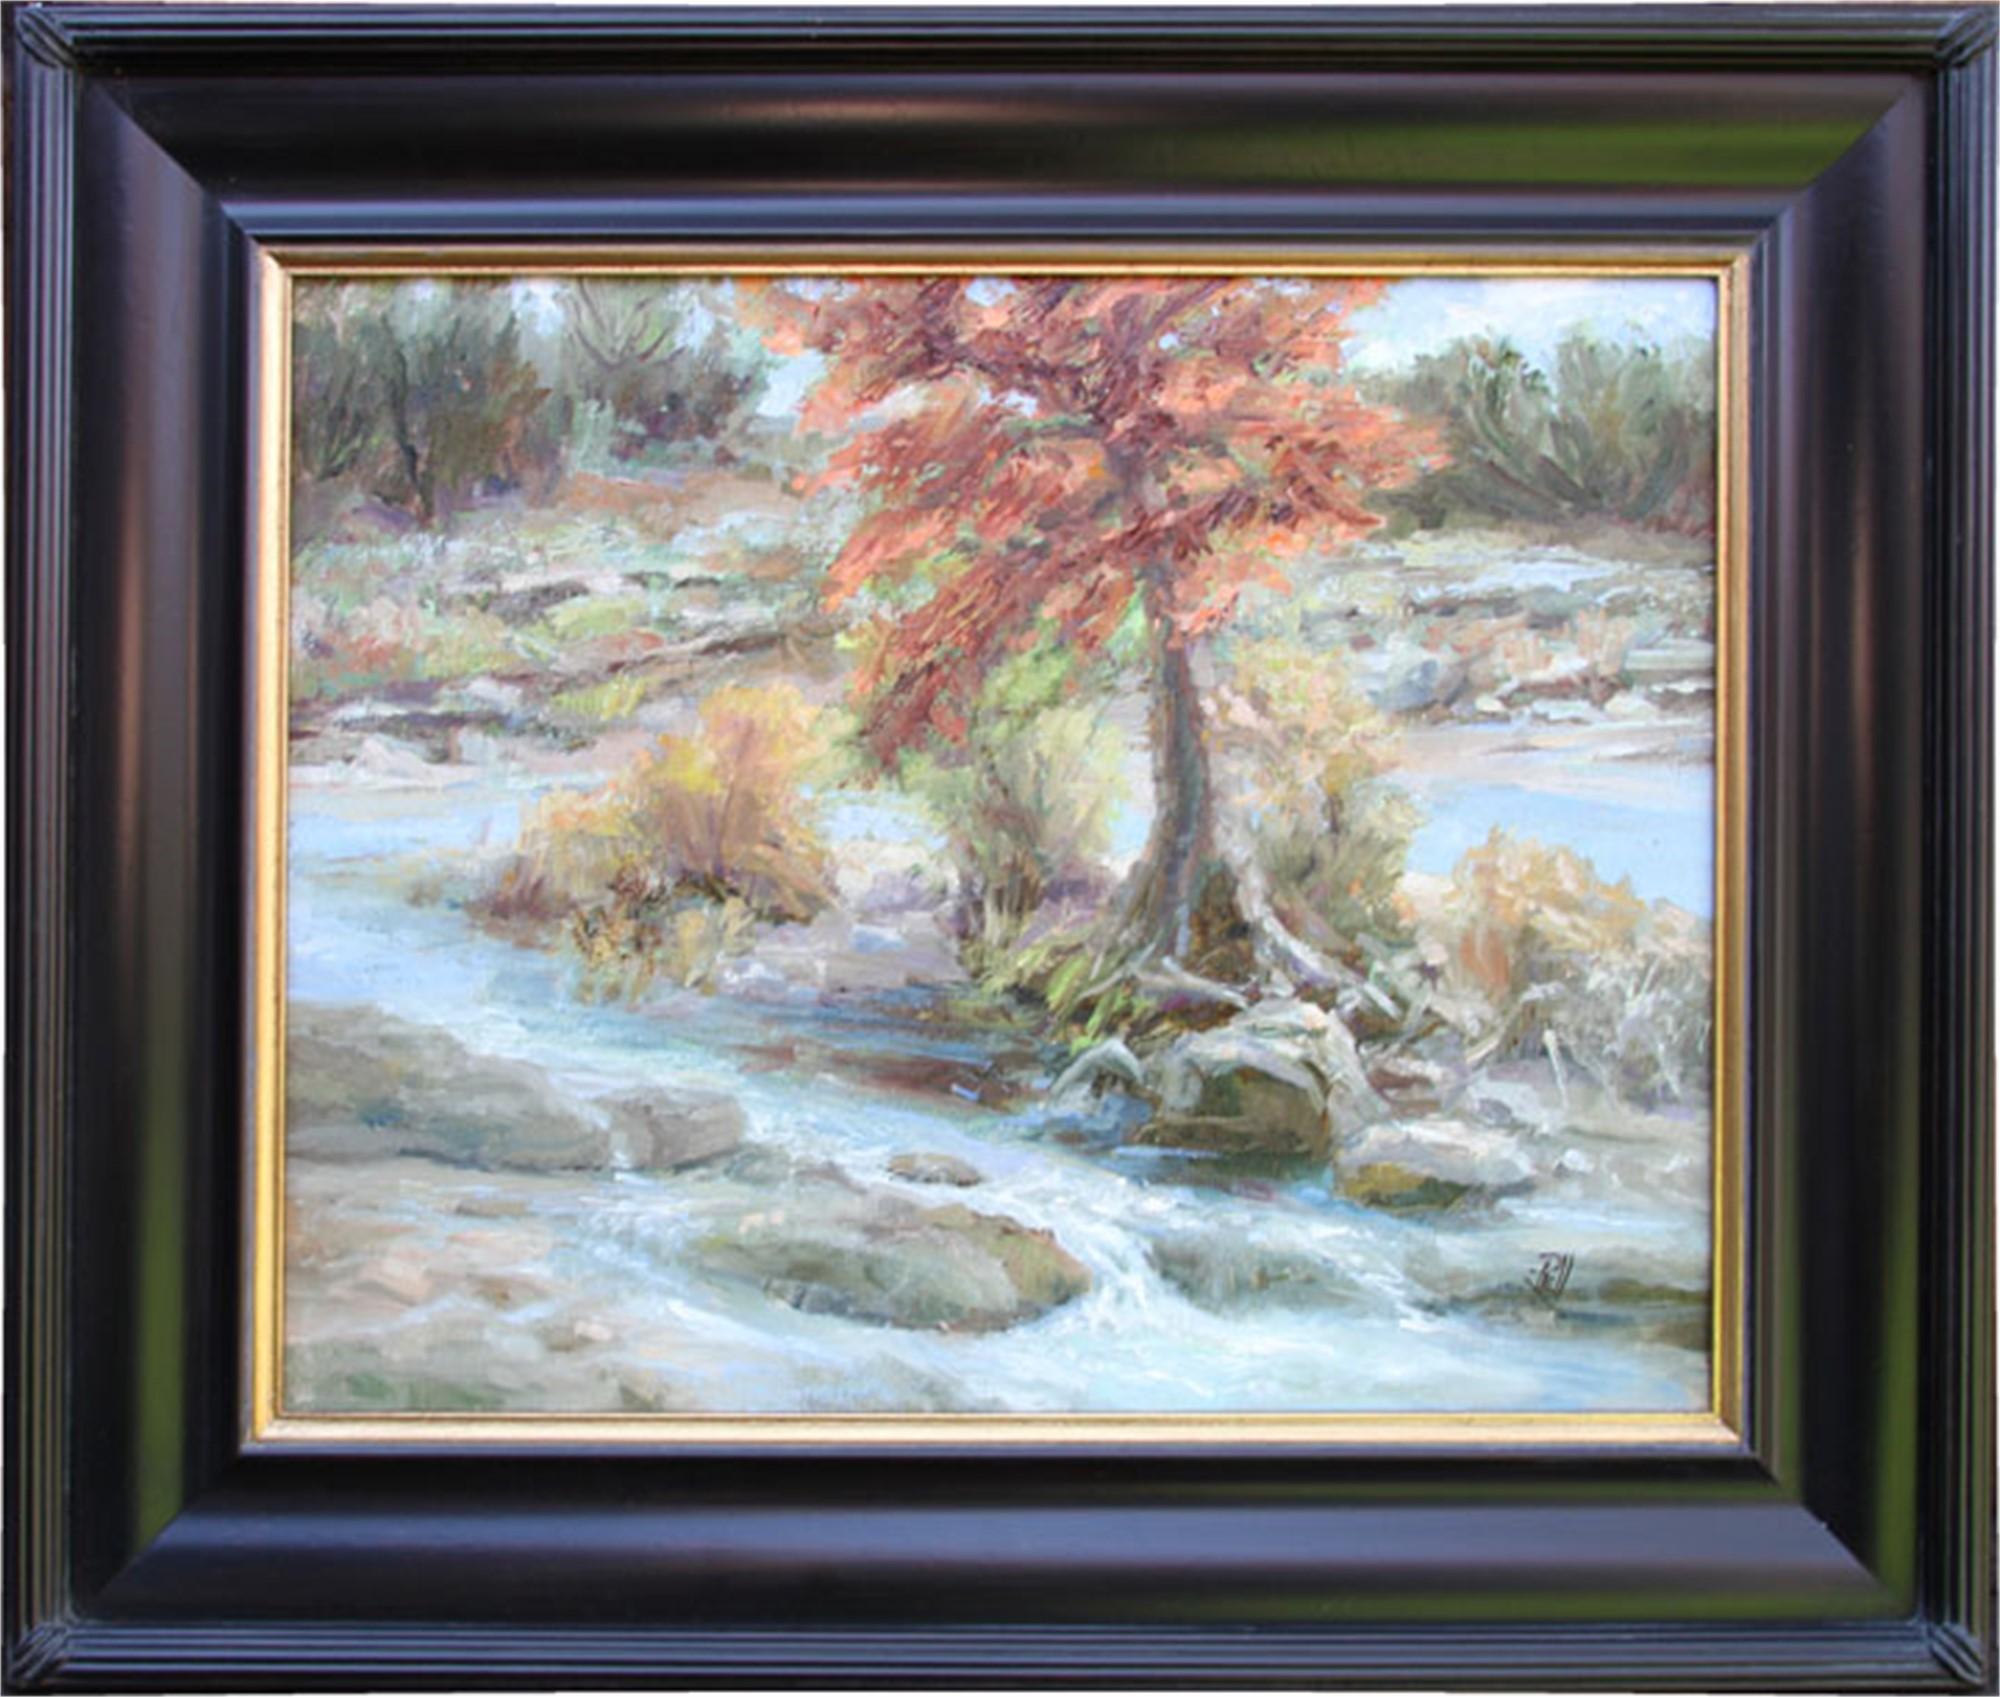 Little Cypress Near Little Arkansas on the Blanco by Lilli Pell